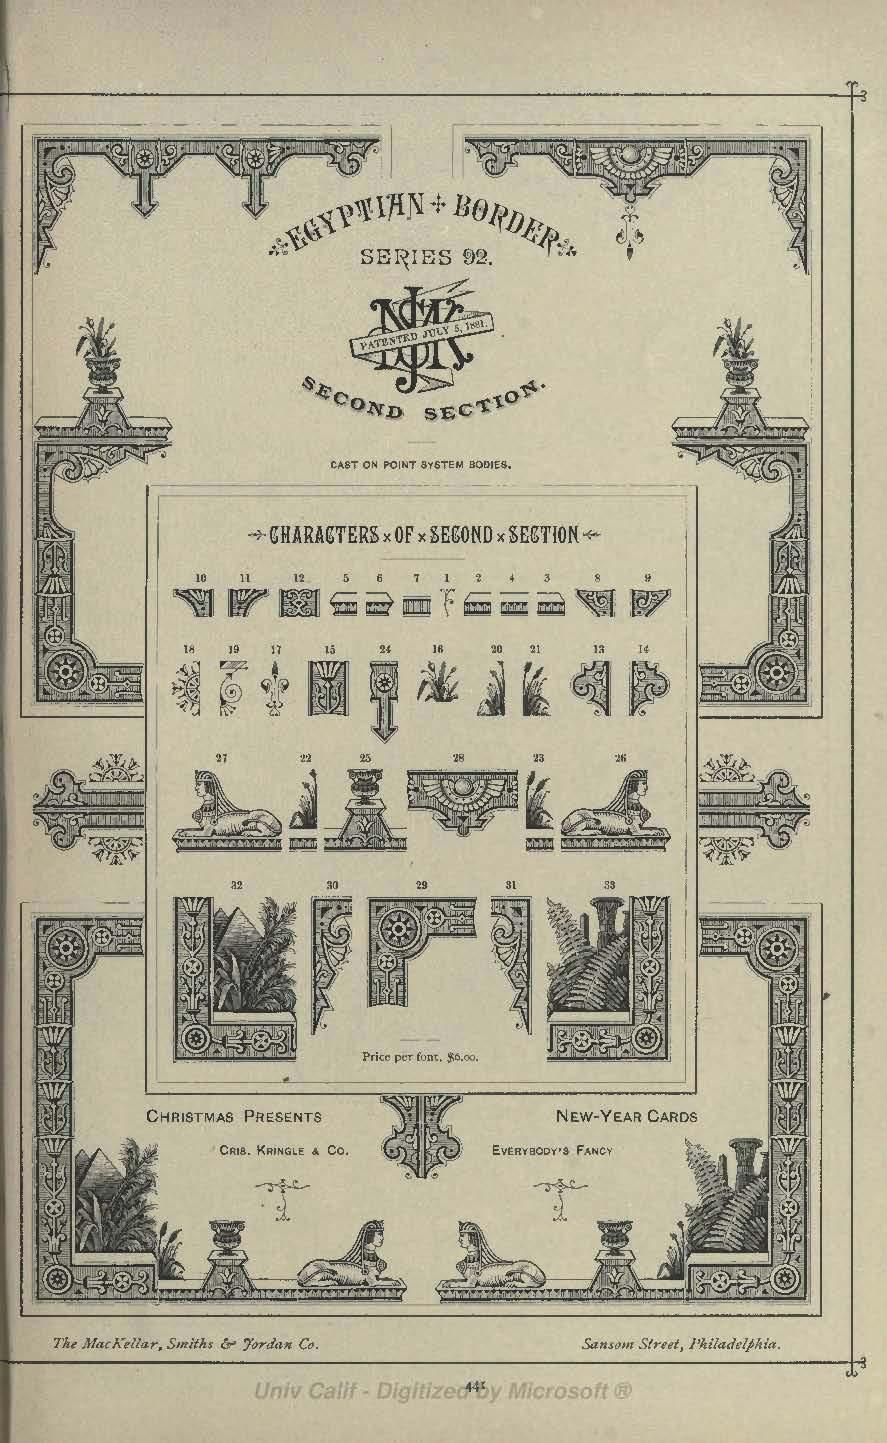 Egyptian Border Second Section from MacKellar Smiths and Jordan 1892 type catalog